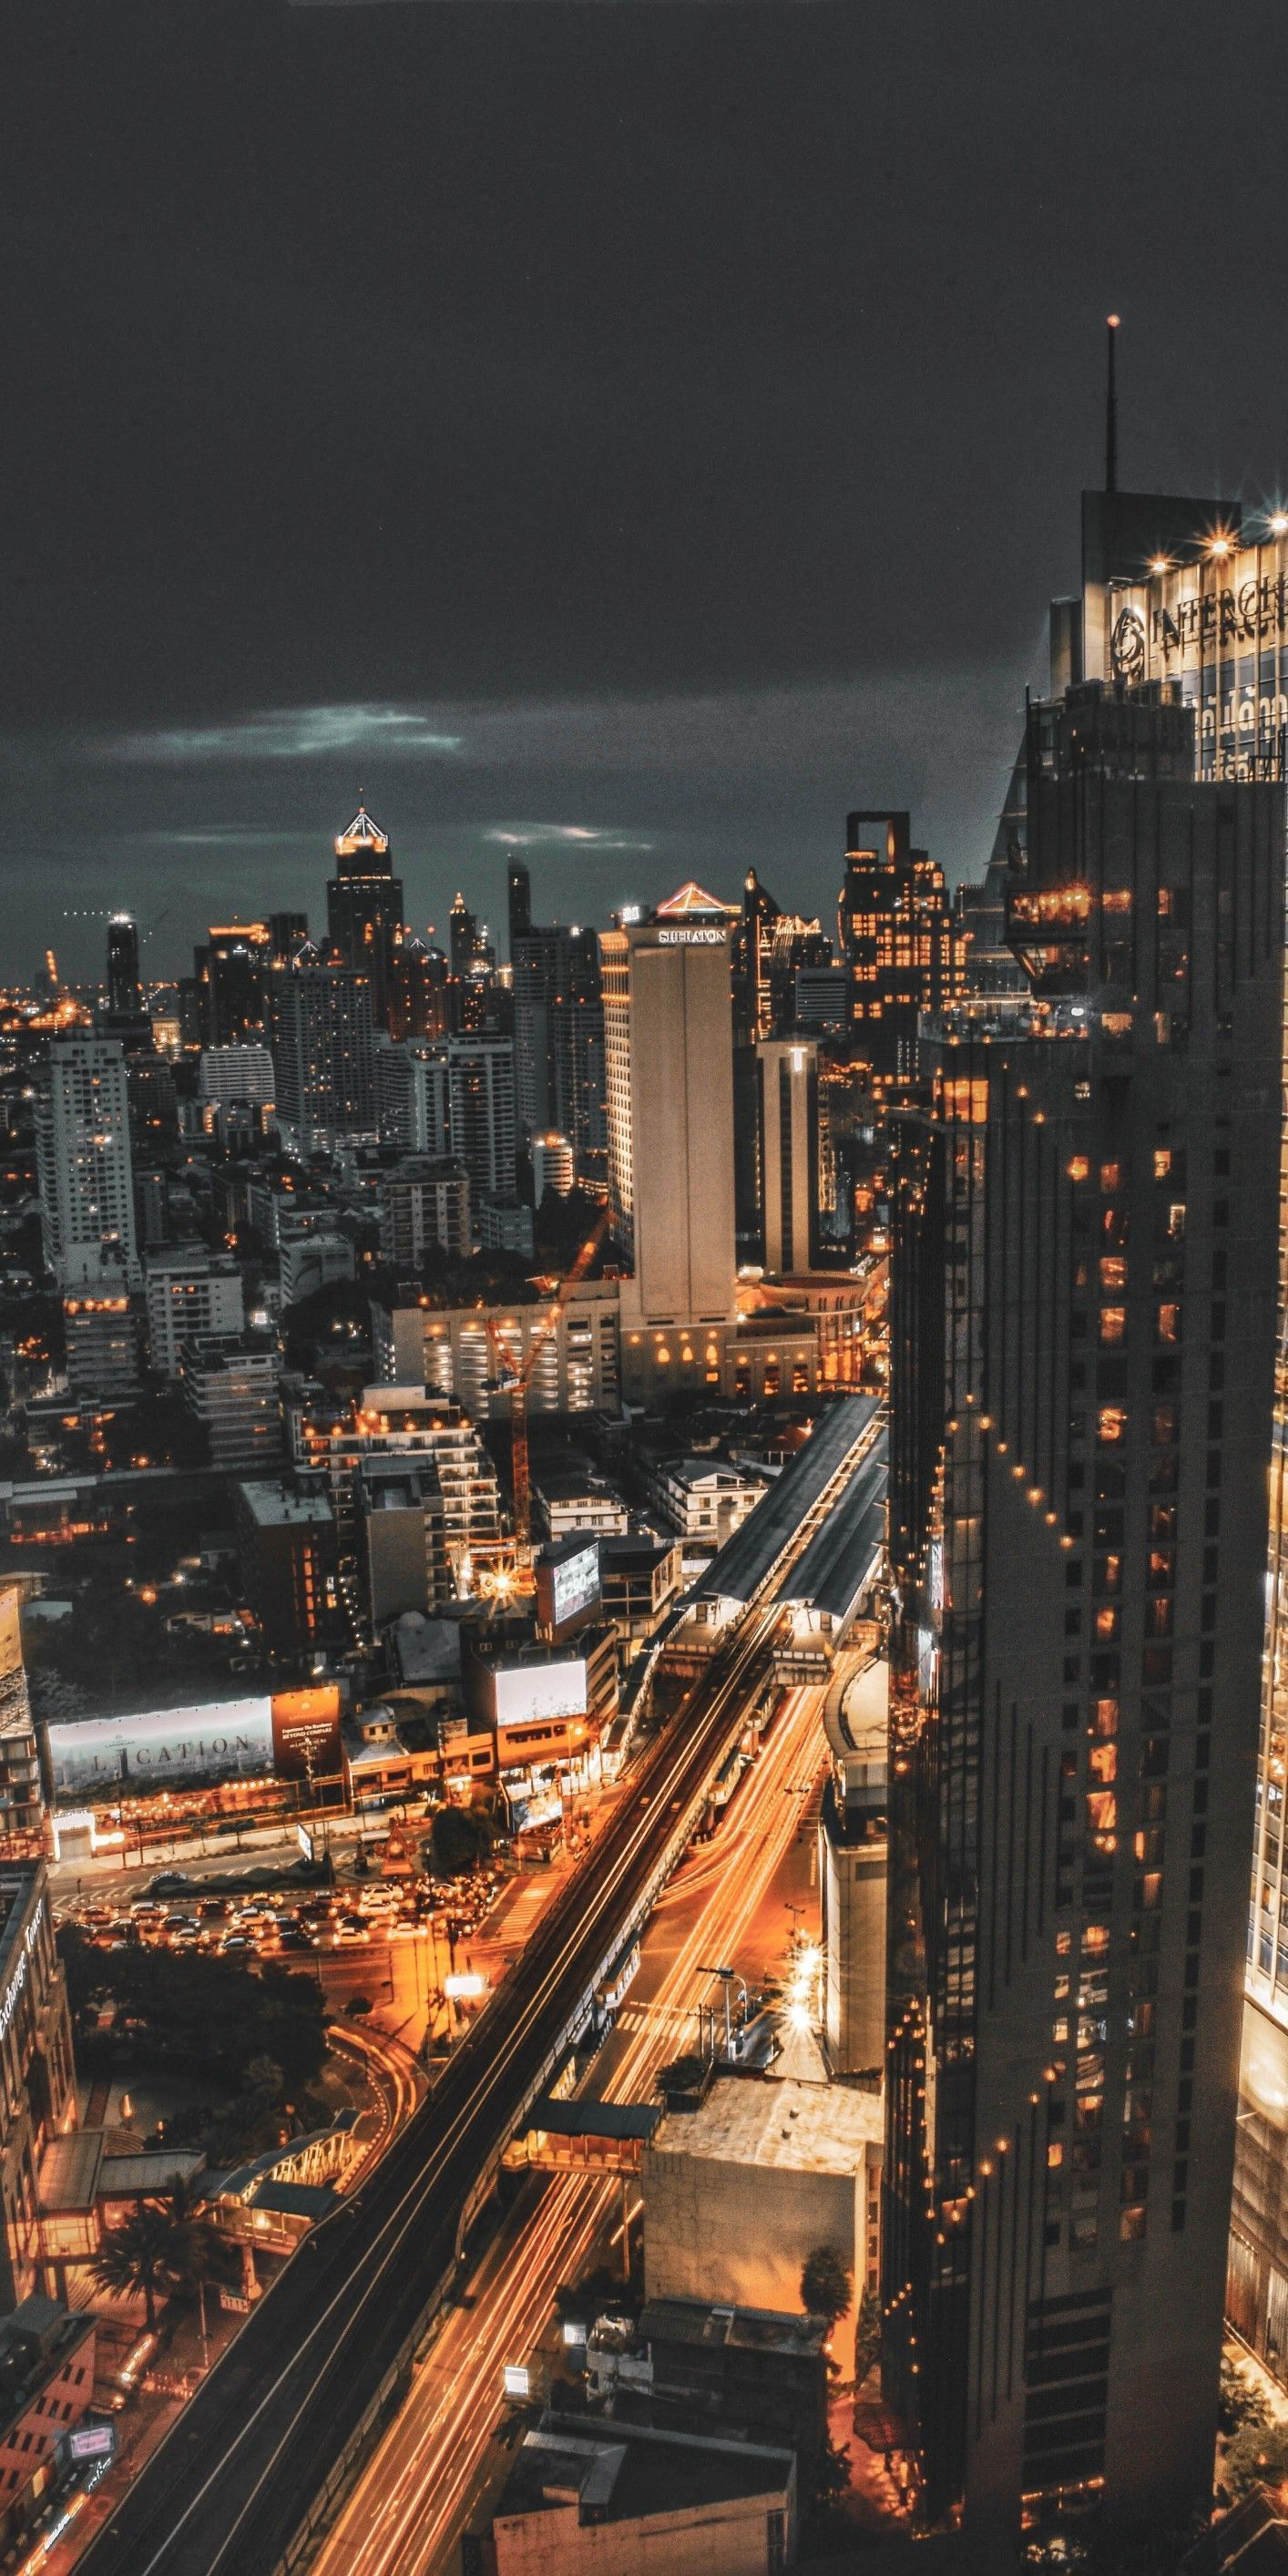 Pin On Macbook Wallpaper Aesthetic Landscape City Wallpaper City Iphone Wallpaper City Aesthetic